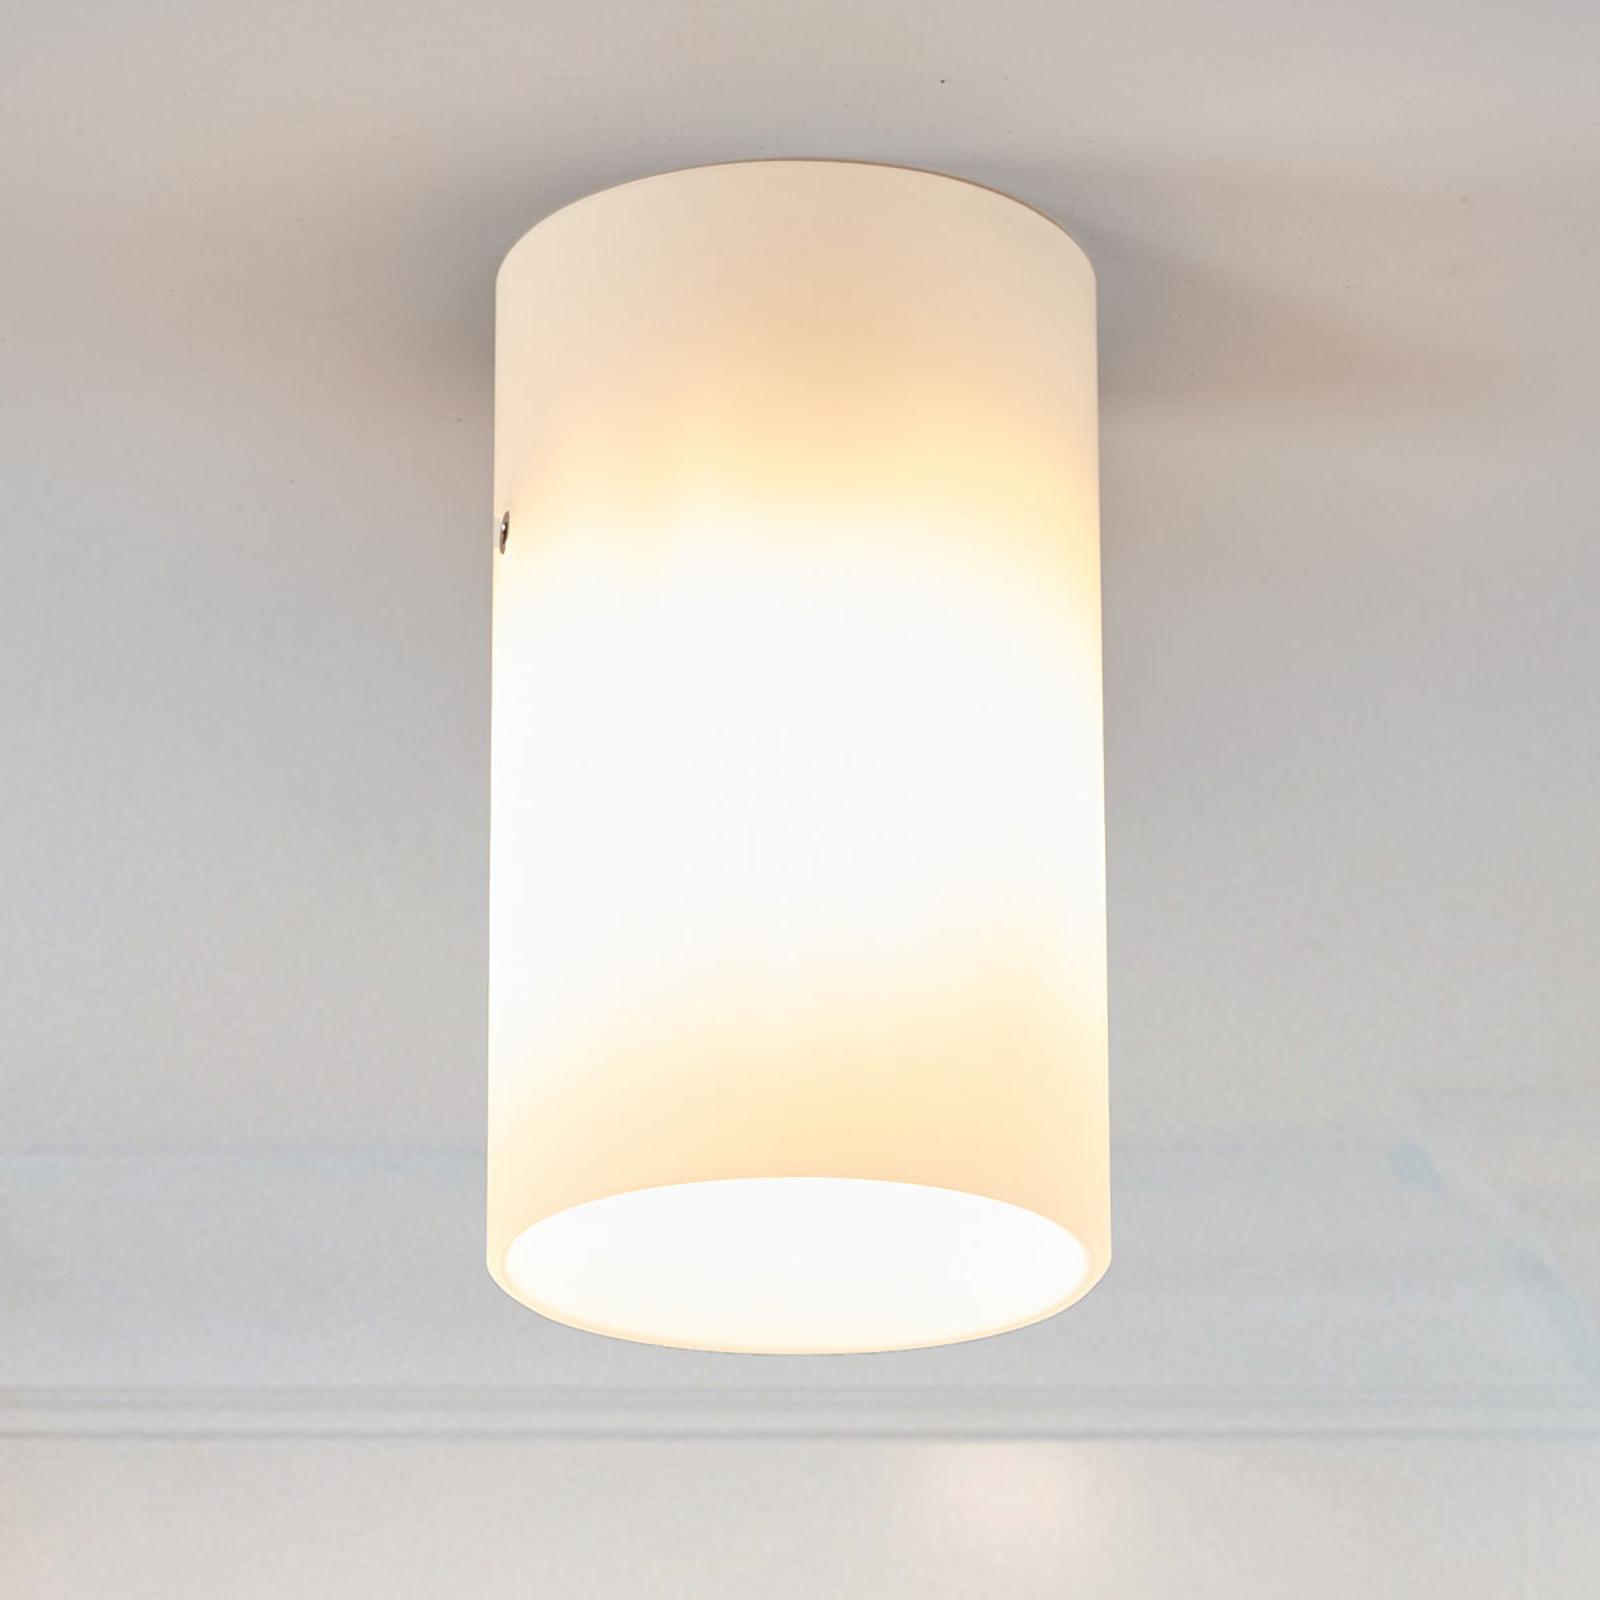 Casablanca Tube plafondlamp, Ø 6 cm, G9-fitting